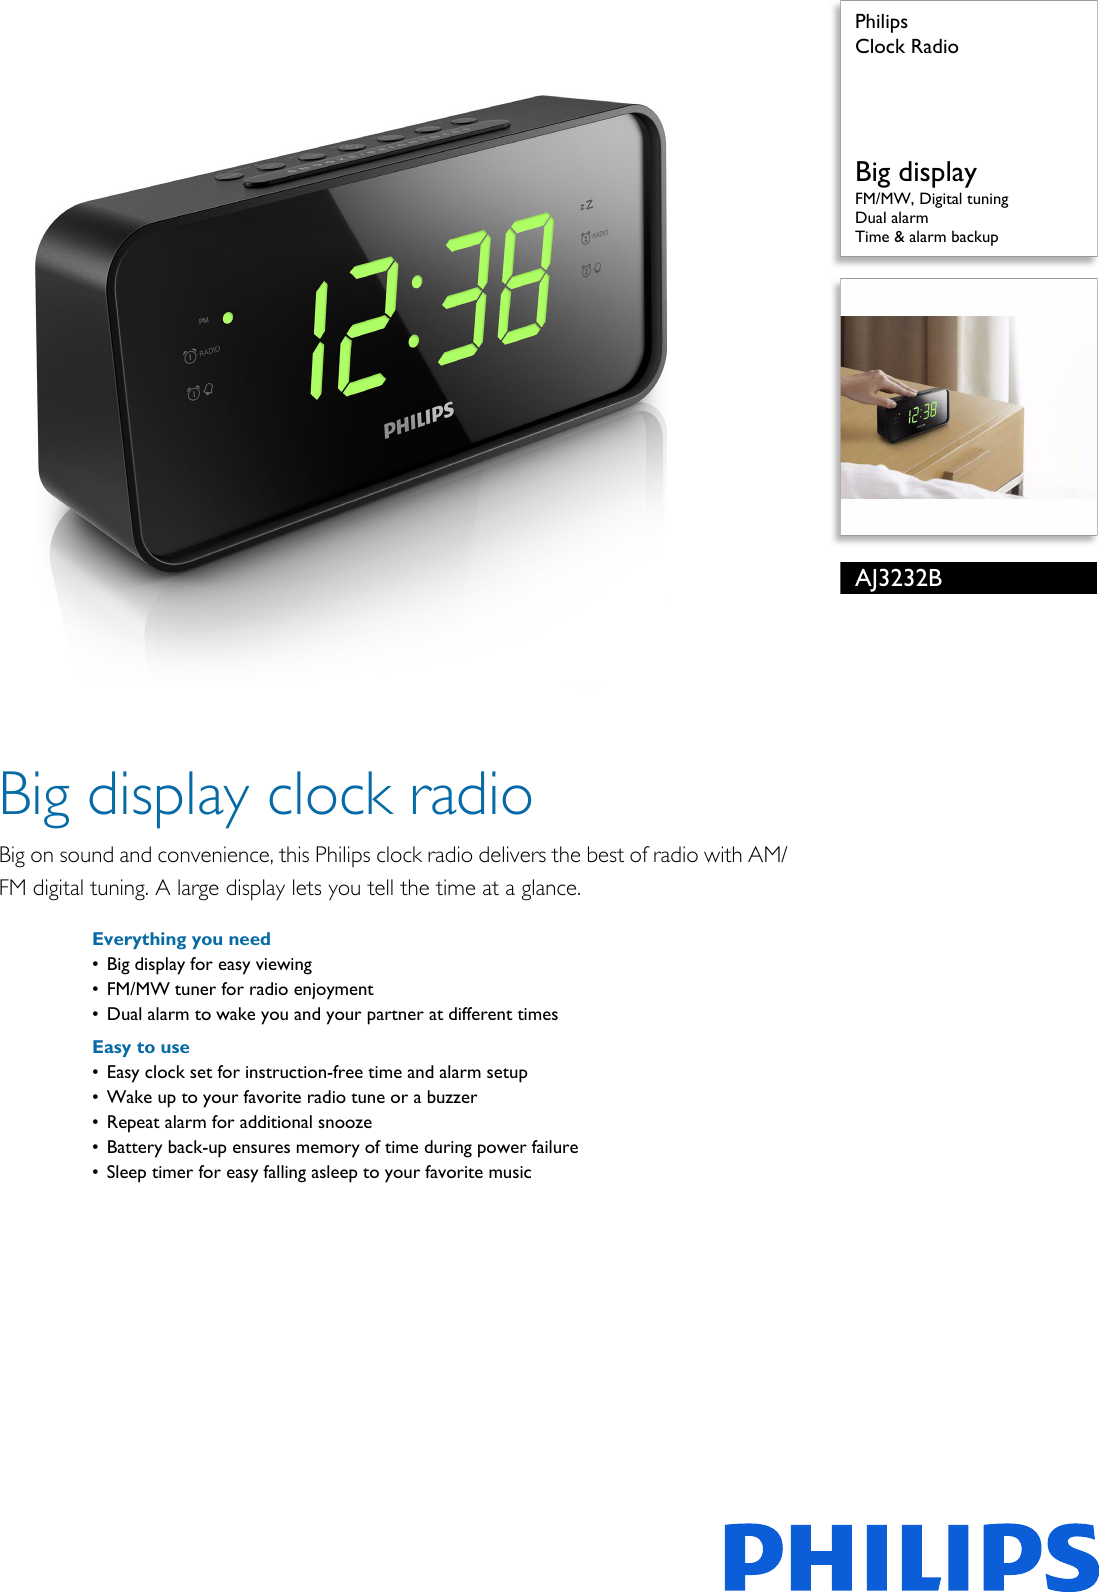 Philips Aj3232b 79 Clock Radio User Manual Leaflet Pss Engau Kit Digital Fm Display Frequensi Counter Untuk Tuner